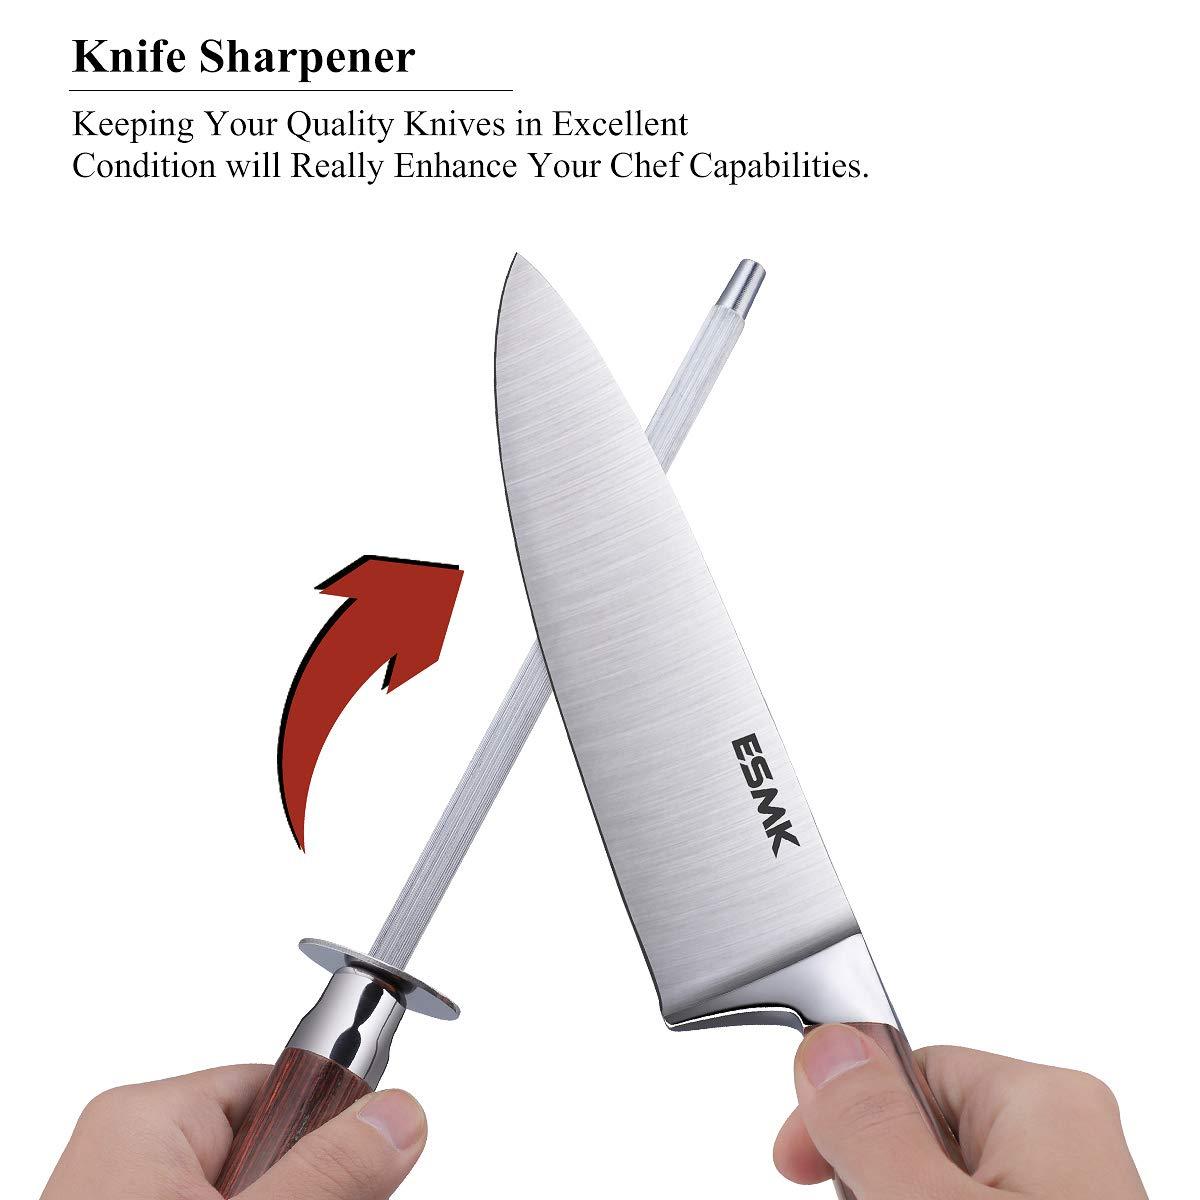 Knife Set, 15-Piece Kitchen Knife Set with Block Wooden, Manual Sharpening for Chef Knife Block Set, German Stainless Steel, ESMK (15 PCs Knife Block Set) by ESMK (Image #4)